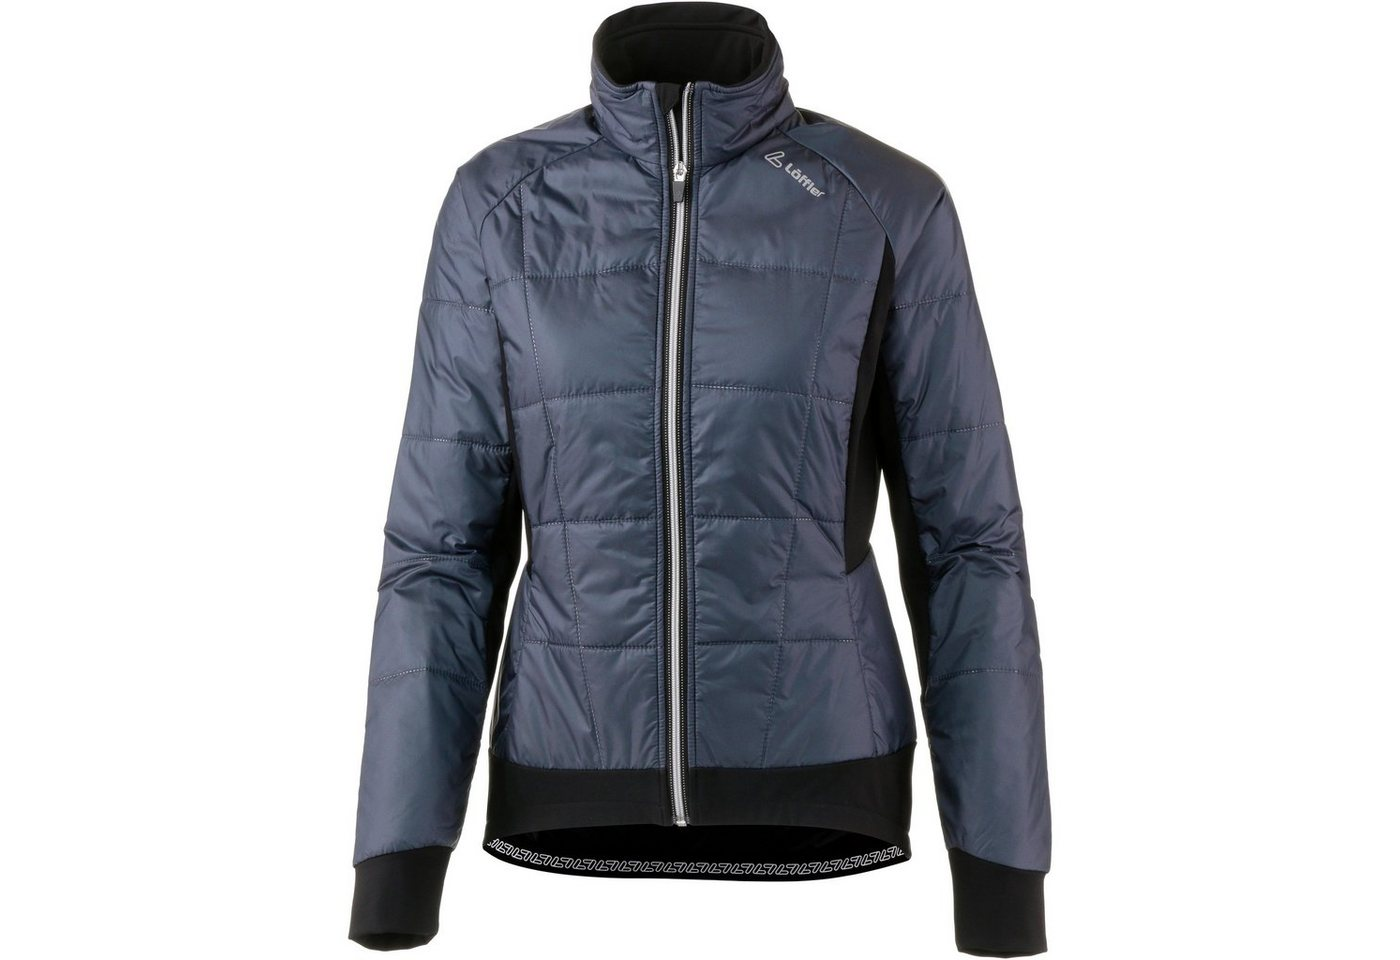 Löffler Fahrradjacke »Iso-Jacke Primaloft Mix« | Sportbekleidung > Sportjacken > Fahrradjacken | Grau | Polyester - Polyamid - Elastan | Löffler